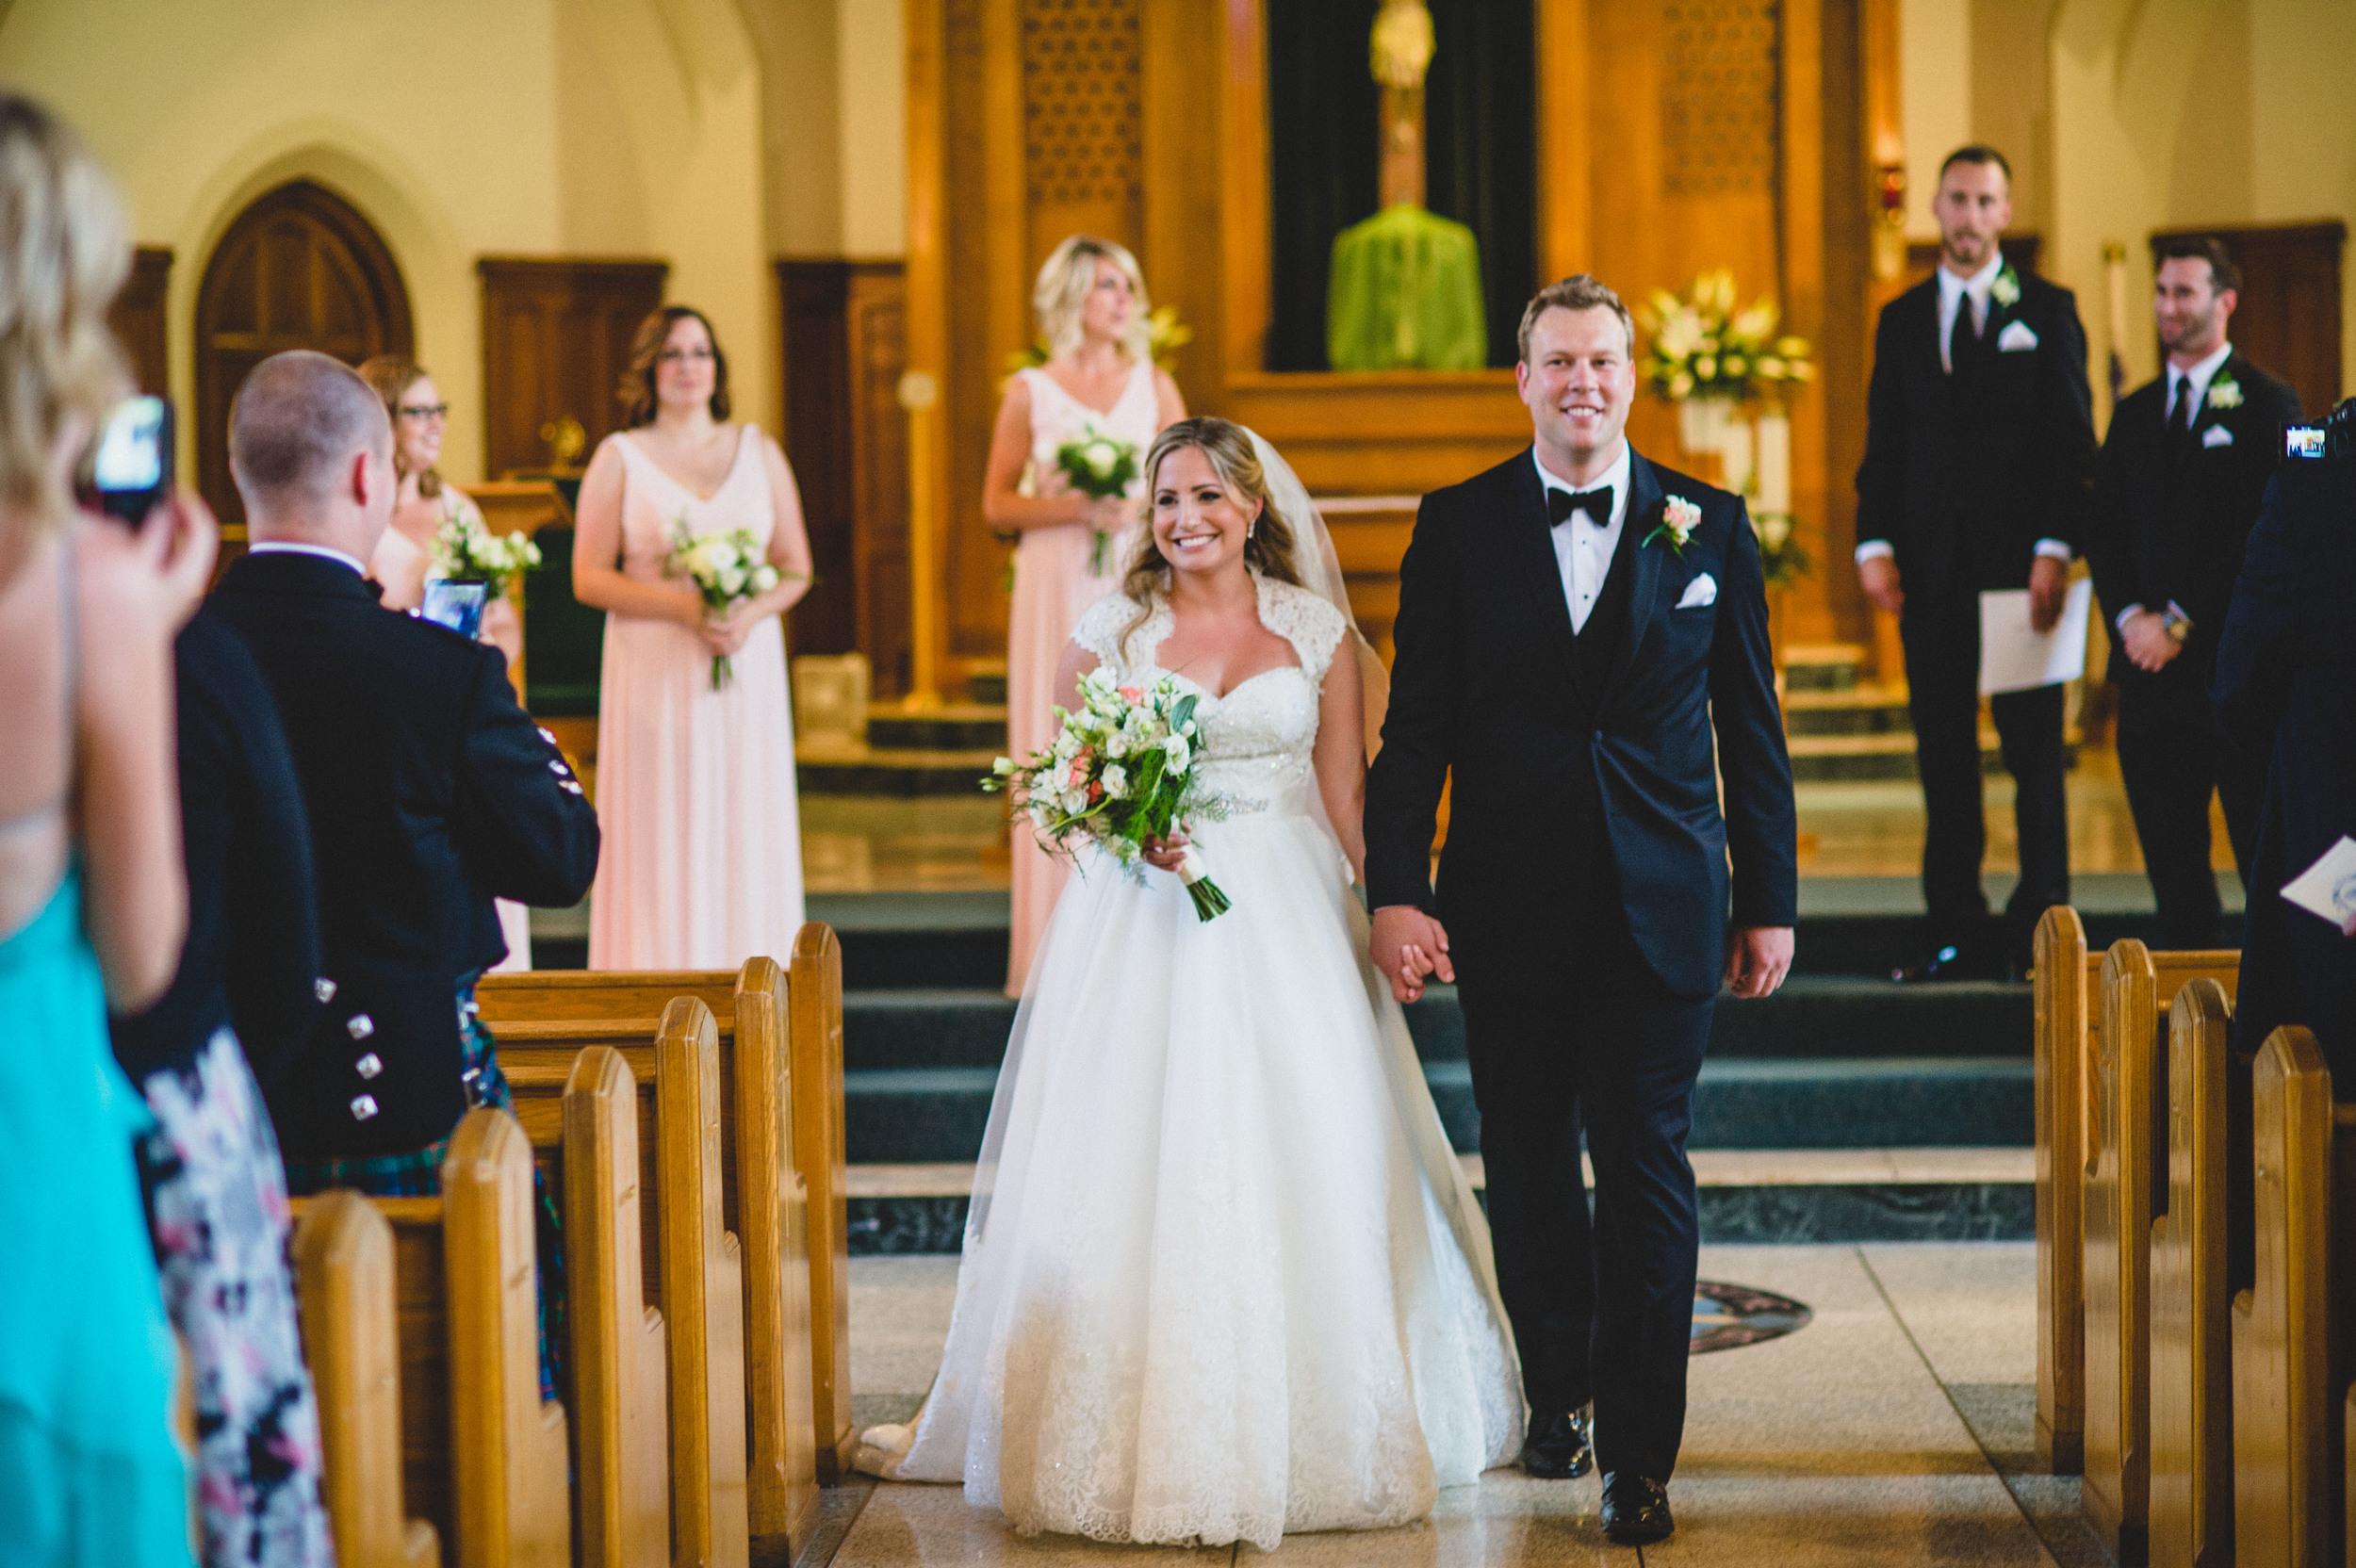 Vancouver St Augustine 's Church wedding photographer edward lai photography-52.jpg